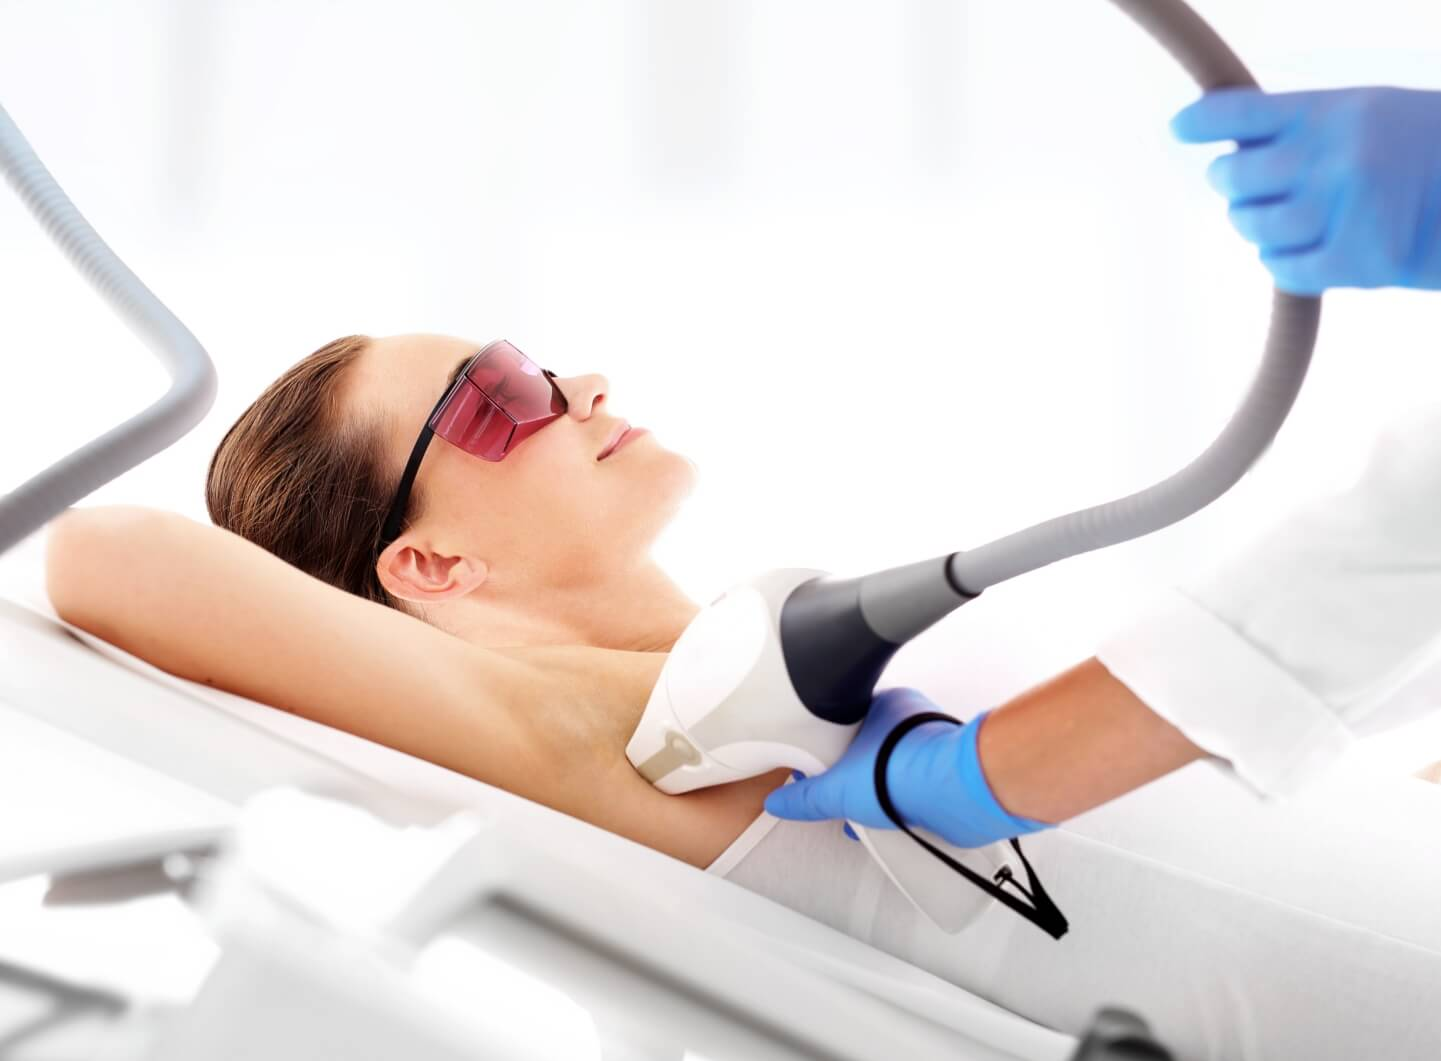 maquina de depilacion trilaser